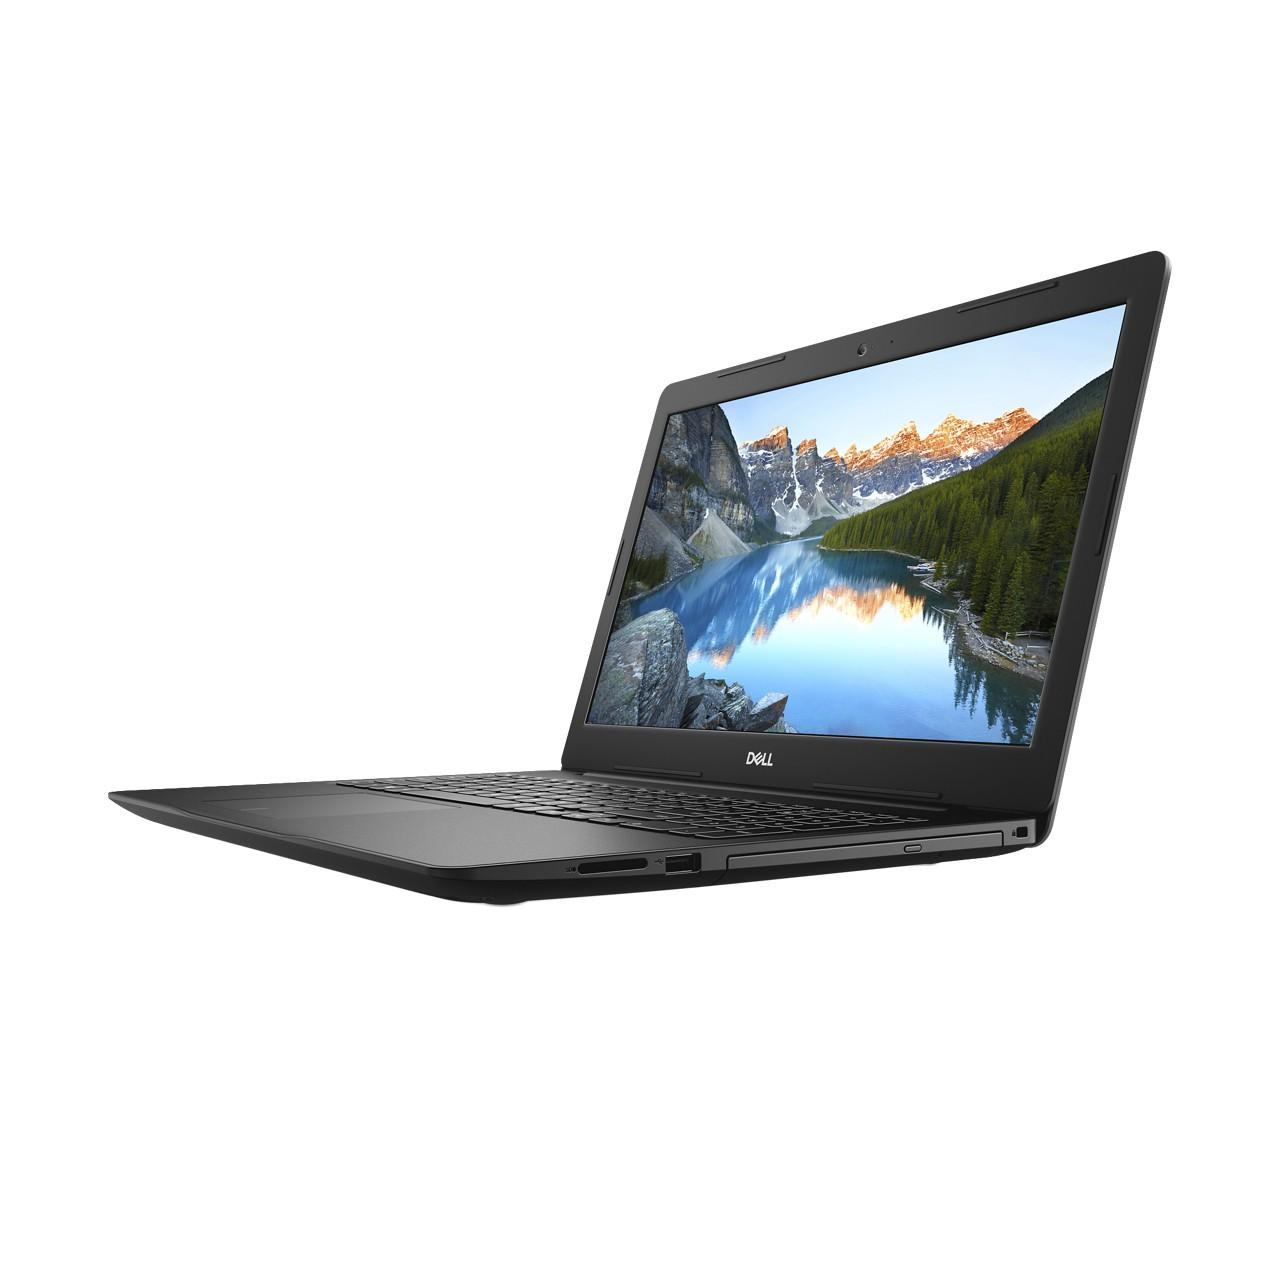 Dell Inspiron 15 3582 Laptop 15 6